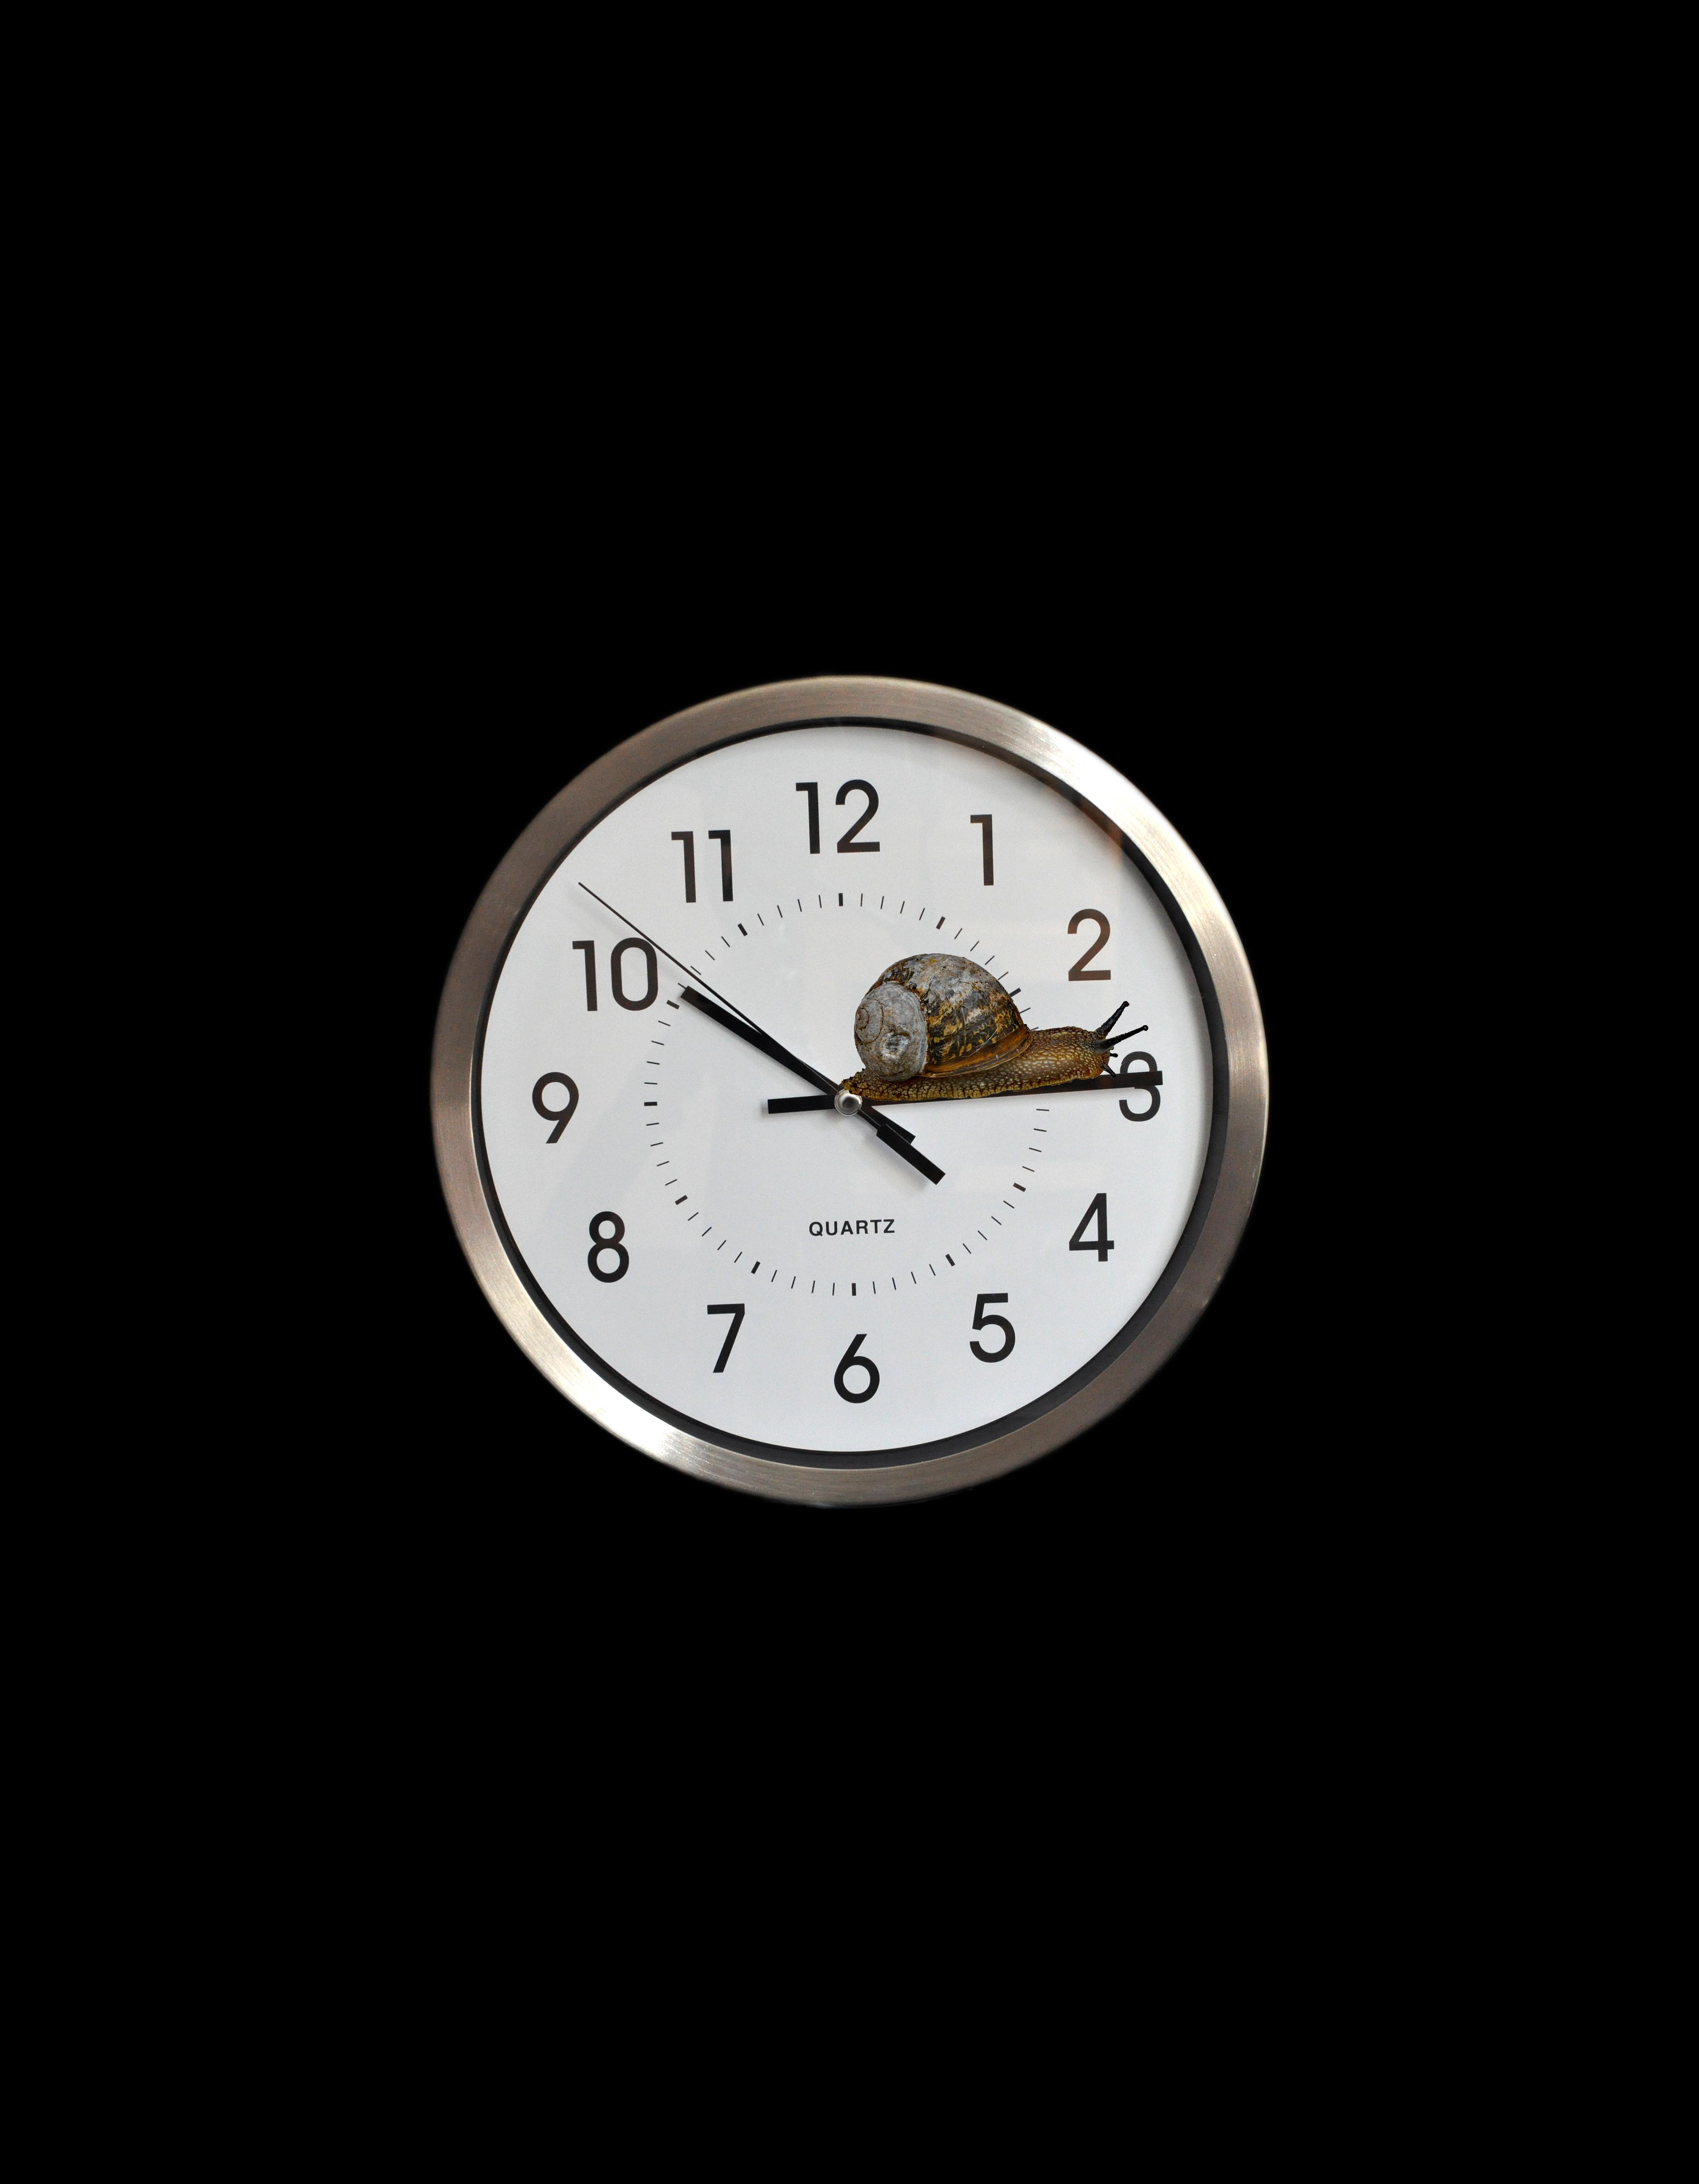 01;Amanda ScottNorton ; Time goes by so